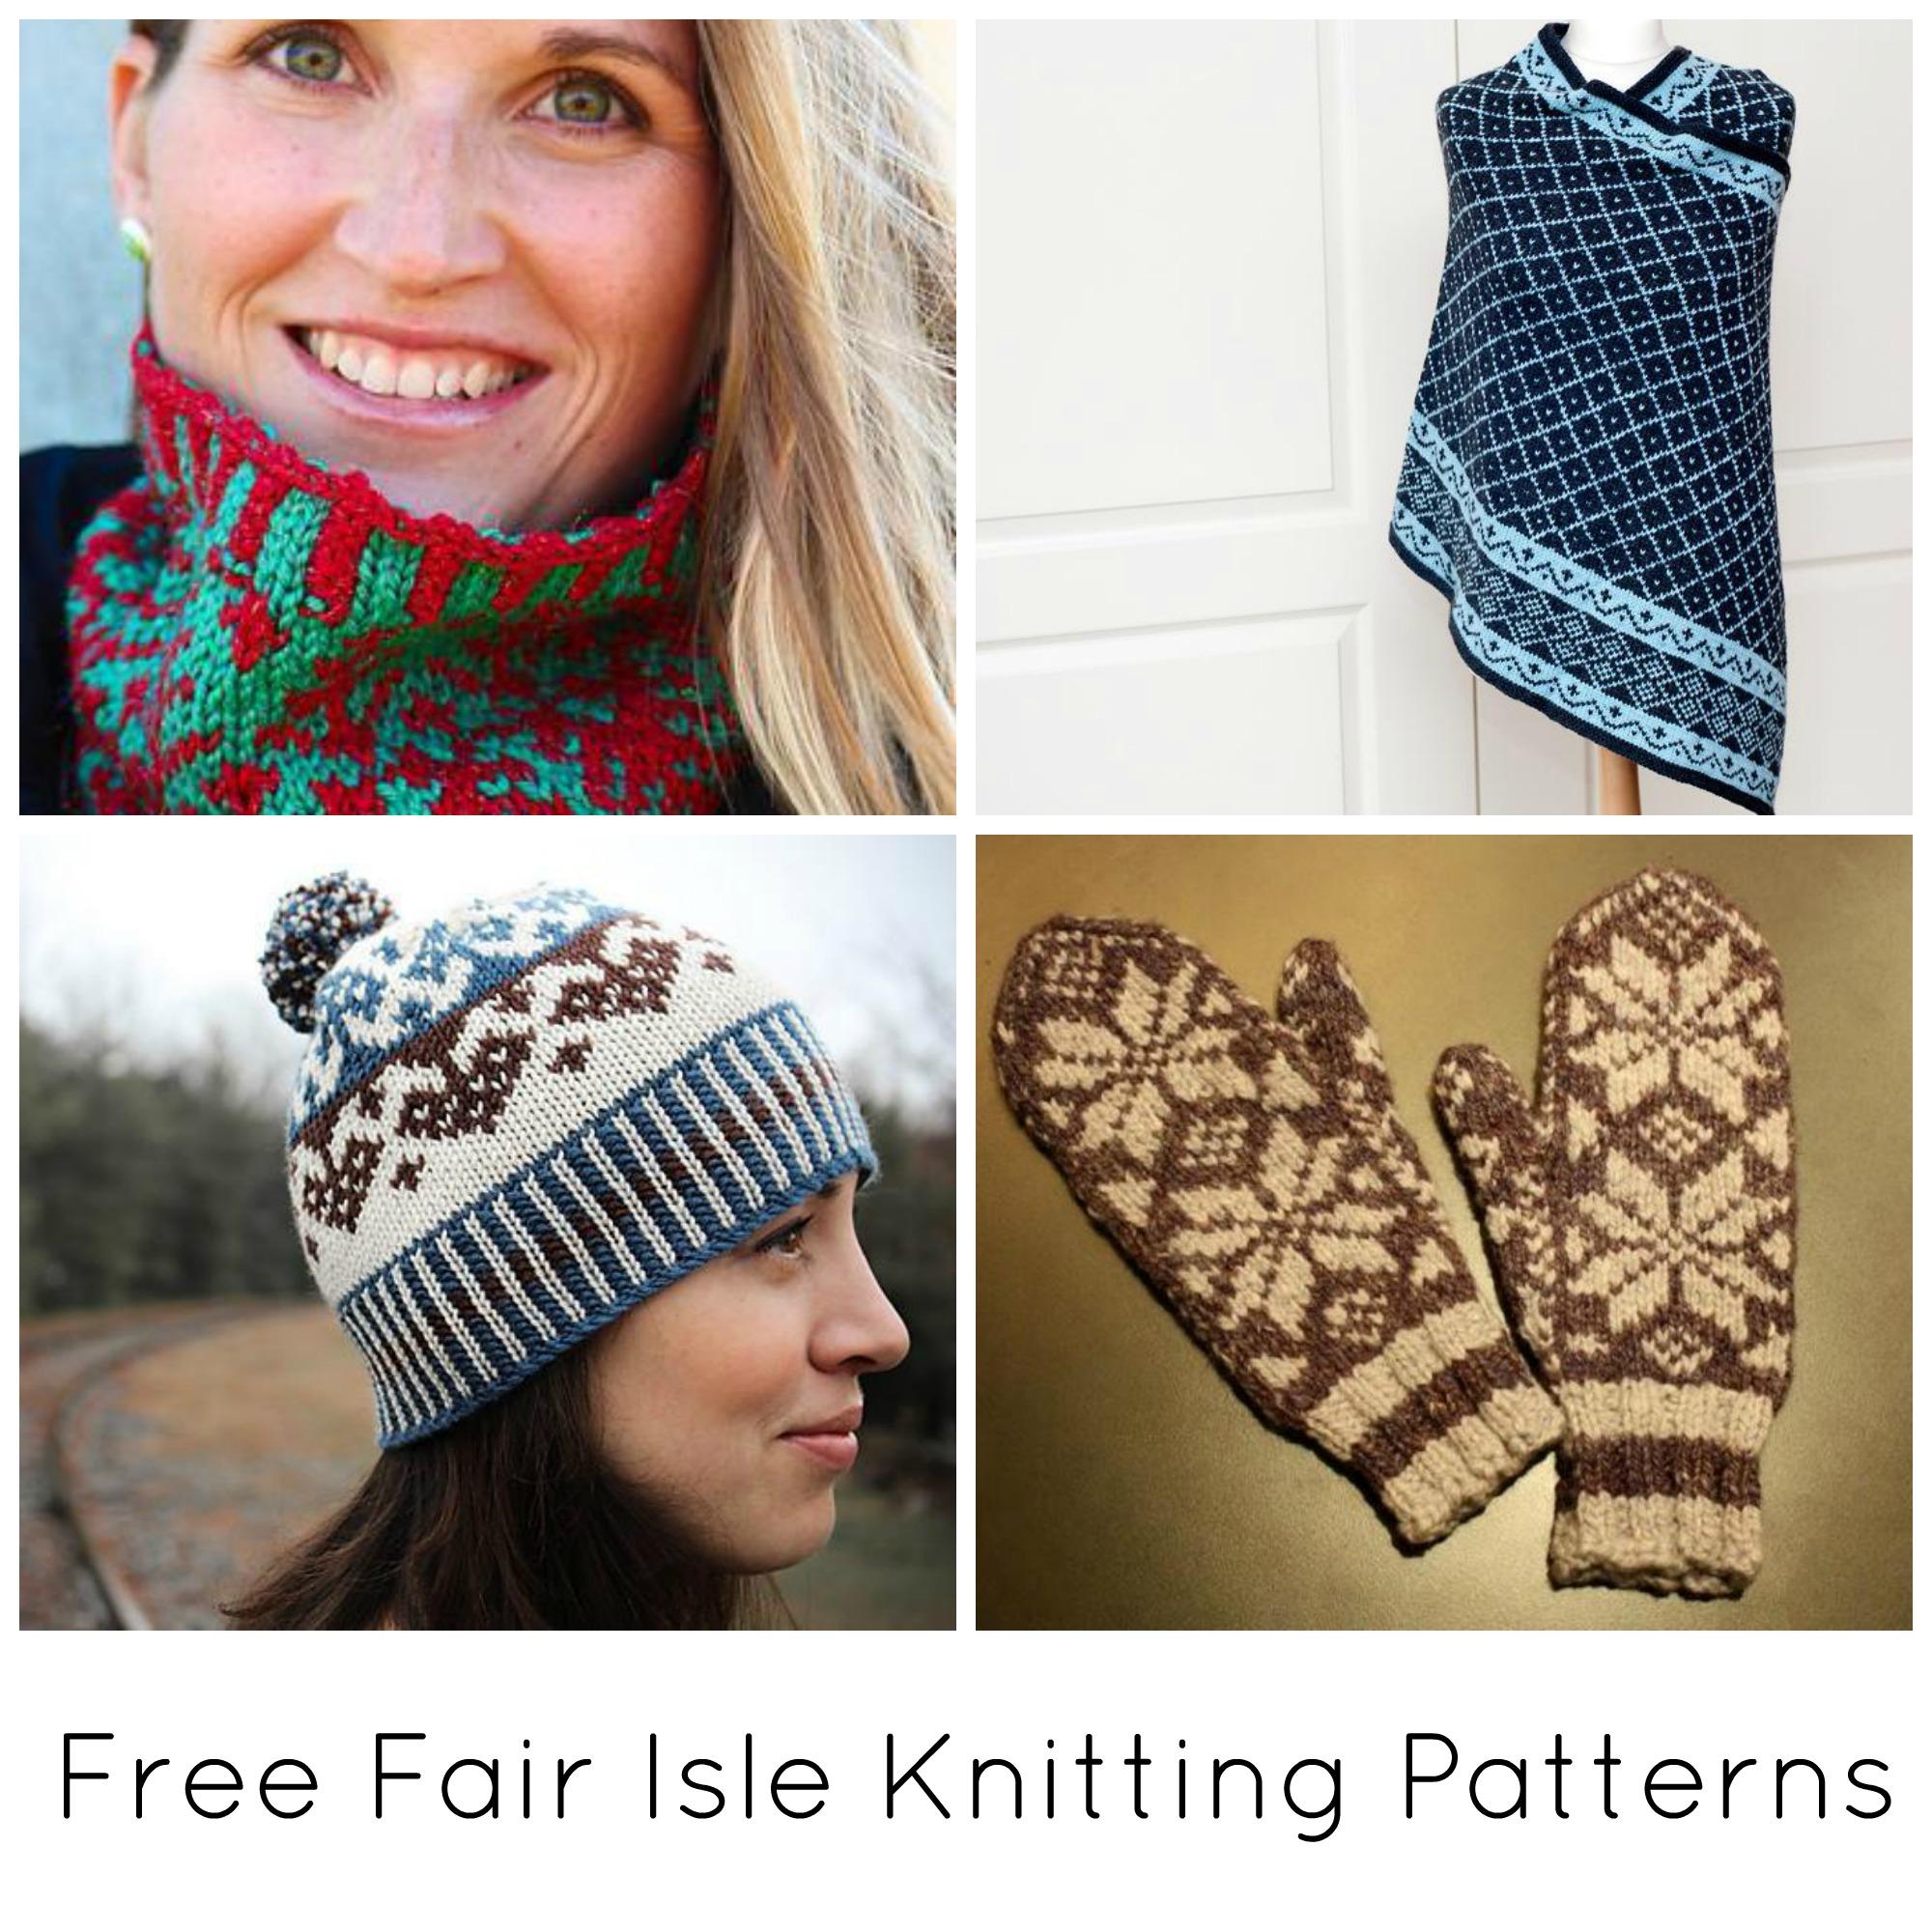 10 Free Fair Isle Knitting Patterns On Bluprint